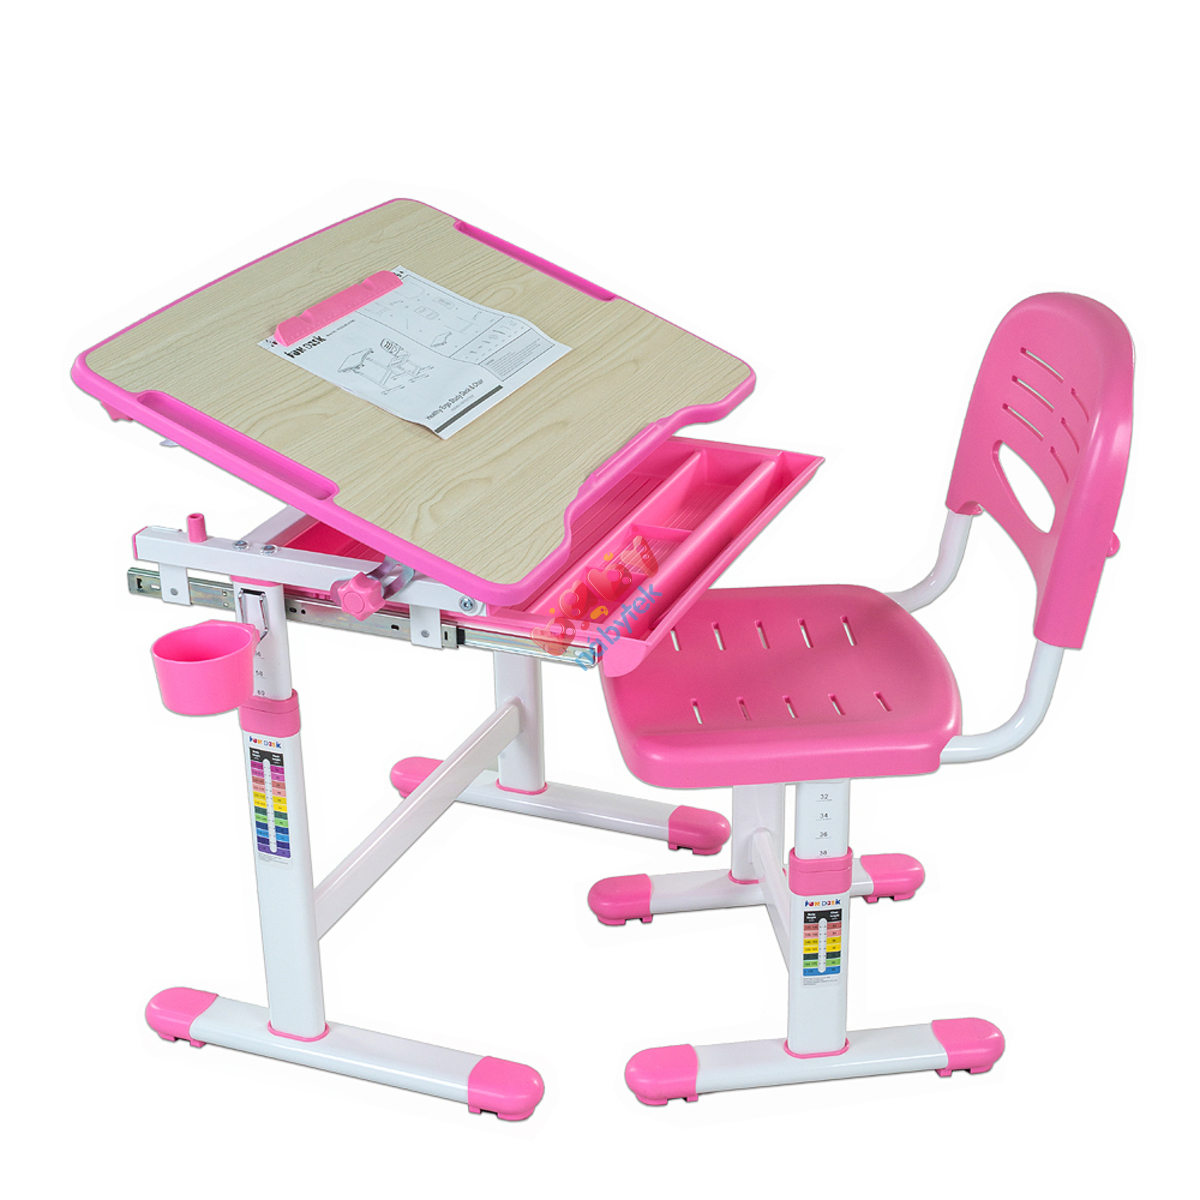 333457628b0c Detský písací stôl + stolička BAMBINO - rôzne farby - Detské písacie ...